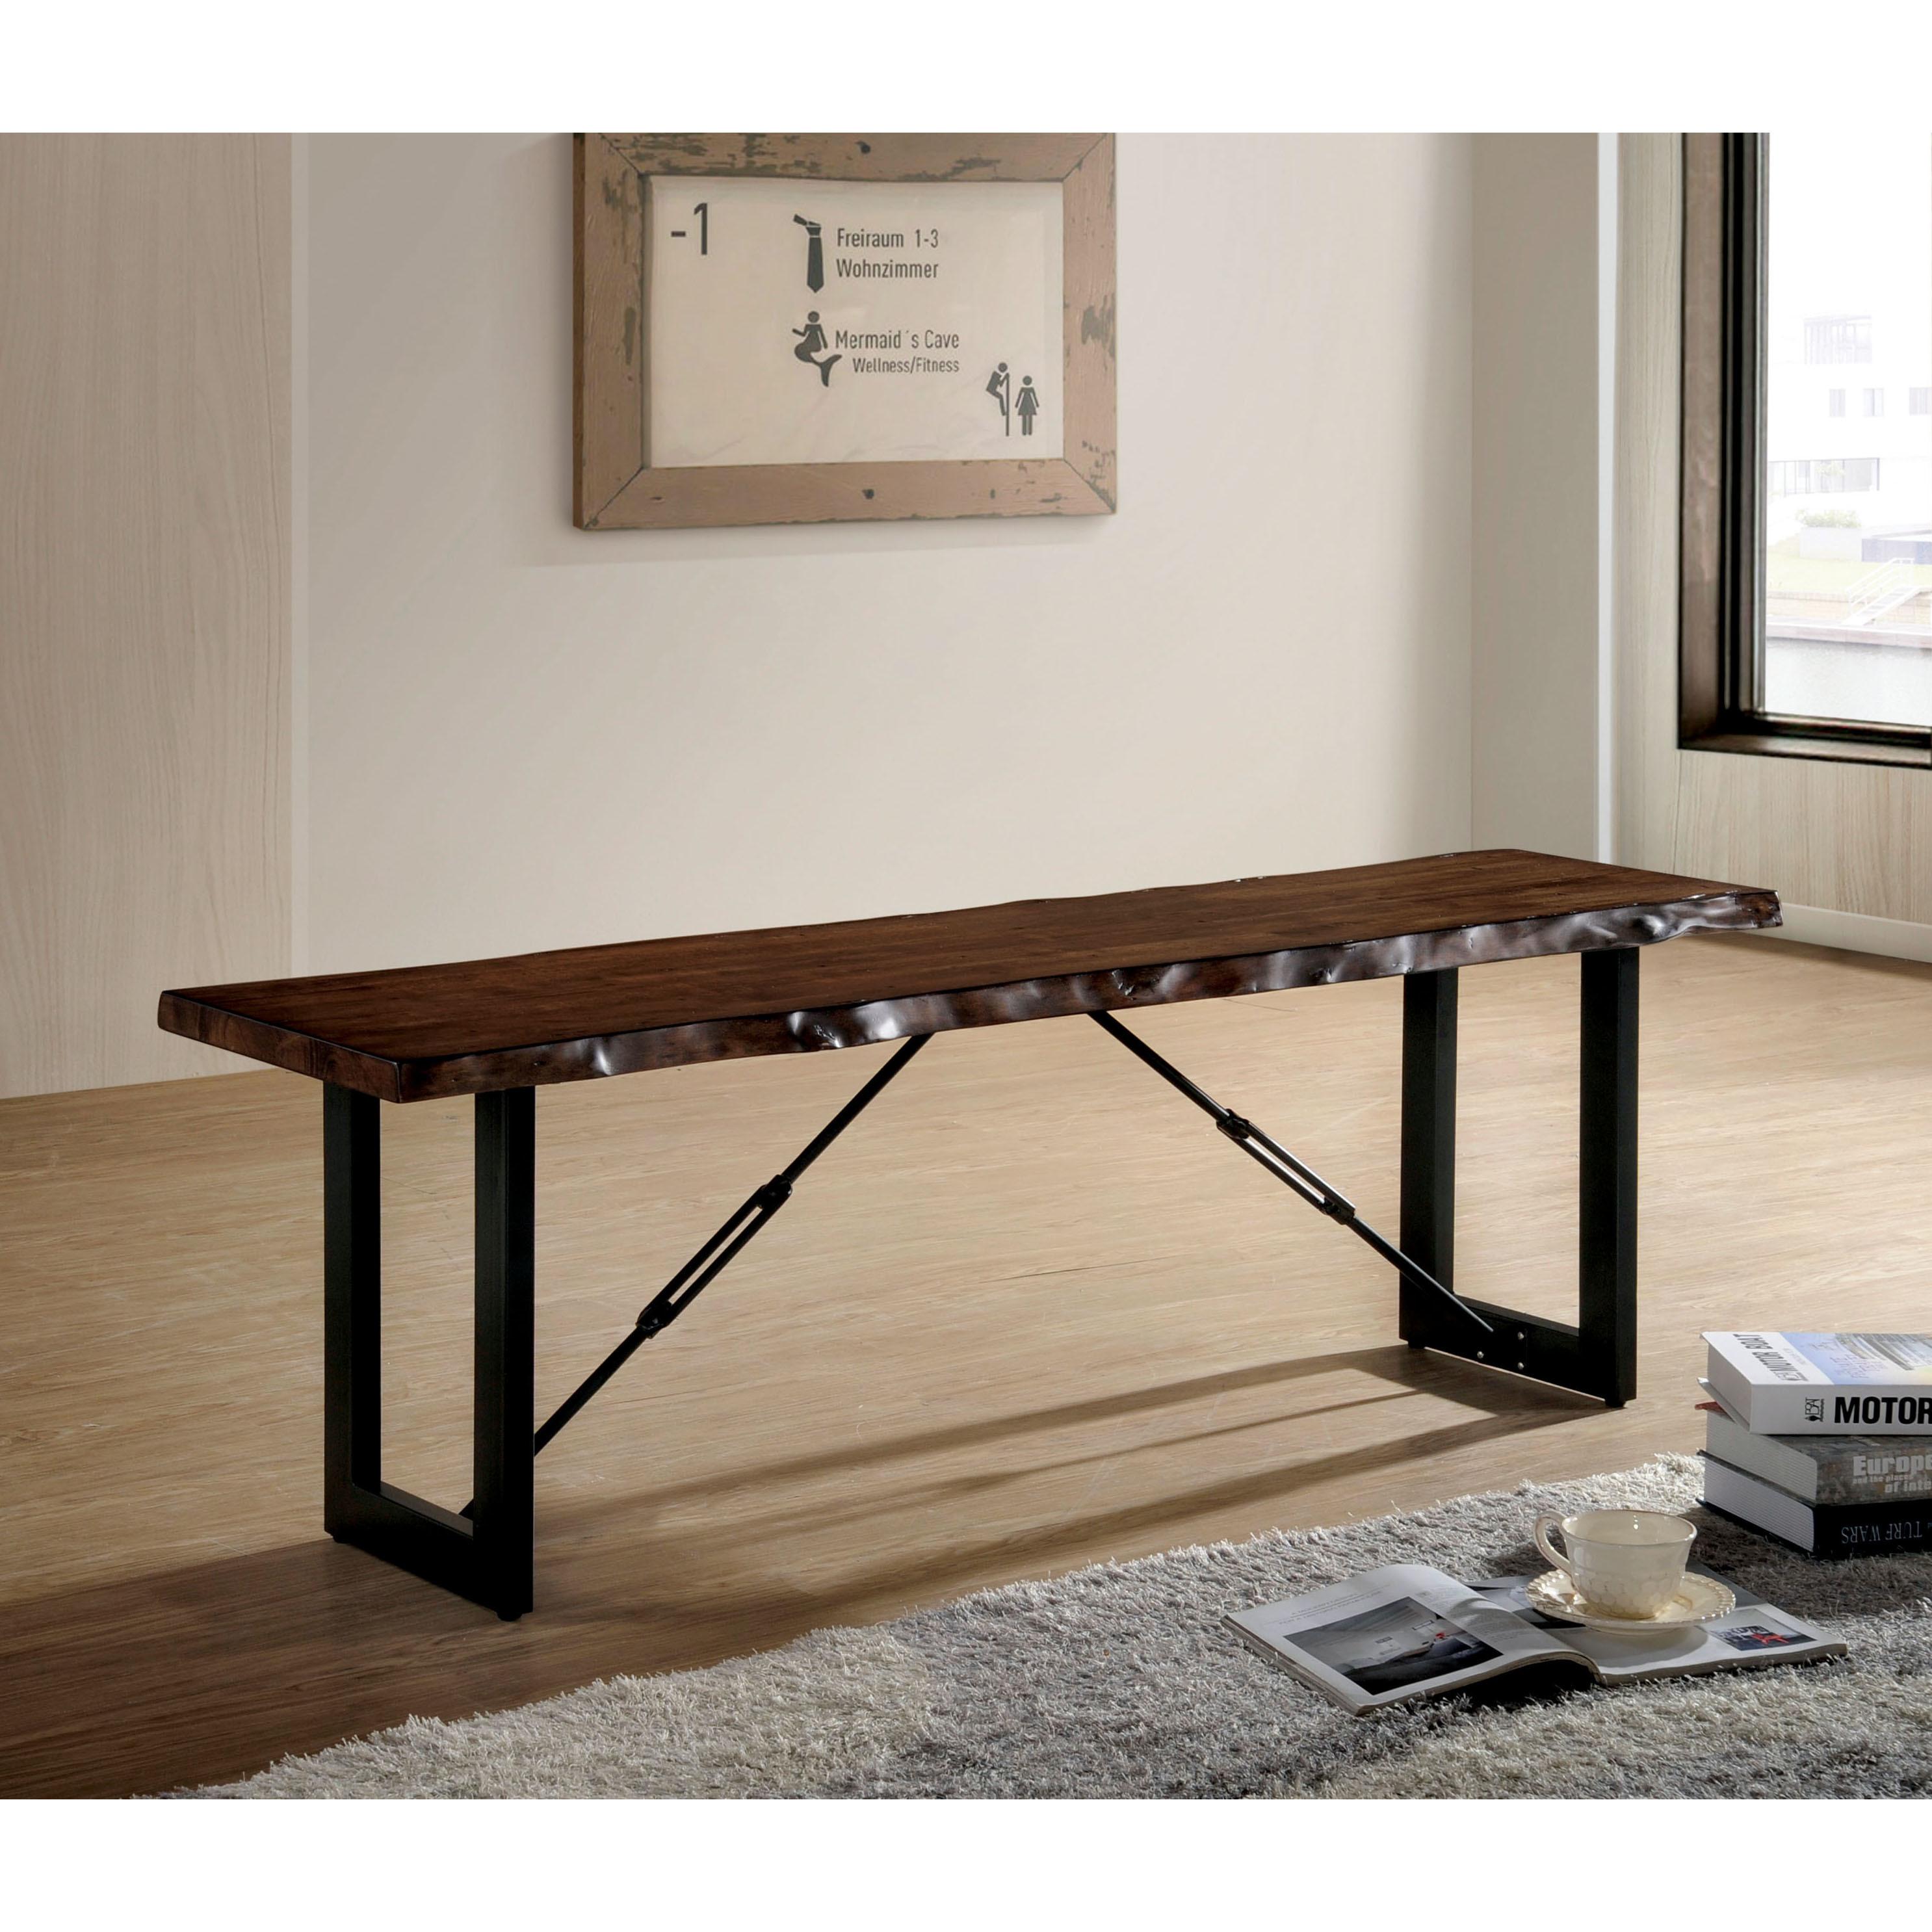 Furniture of america terele rustic industrial walnut wood metal 54 inch bench